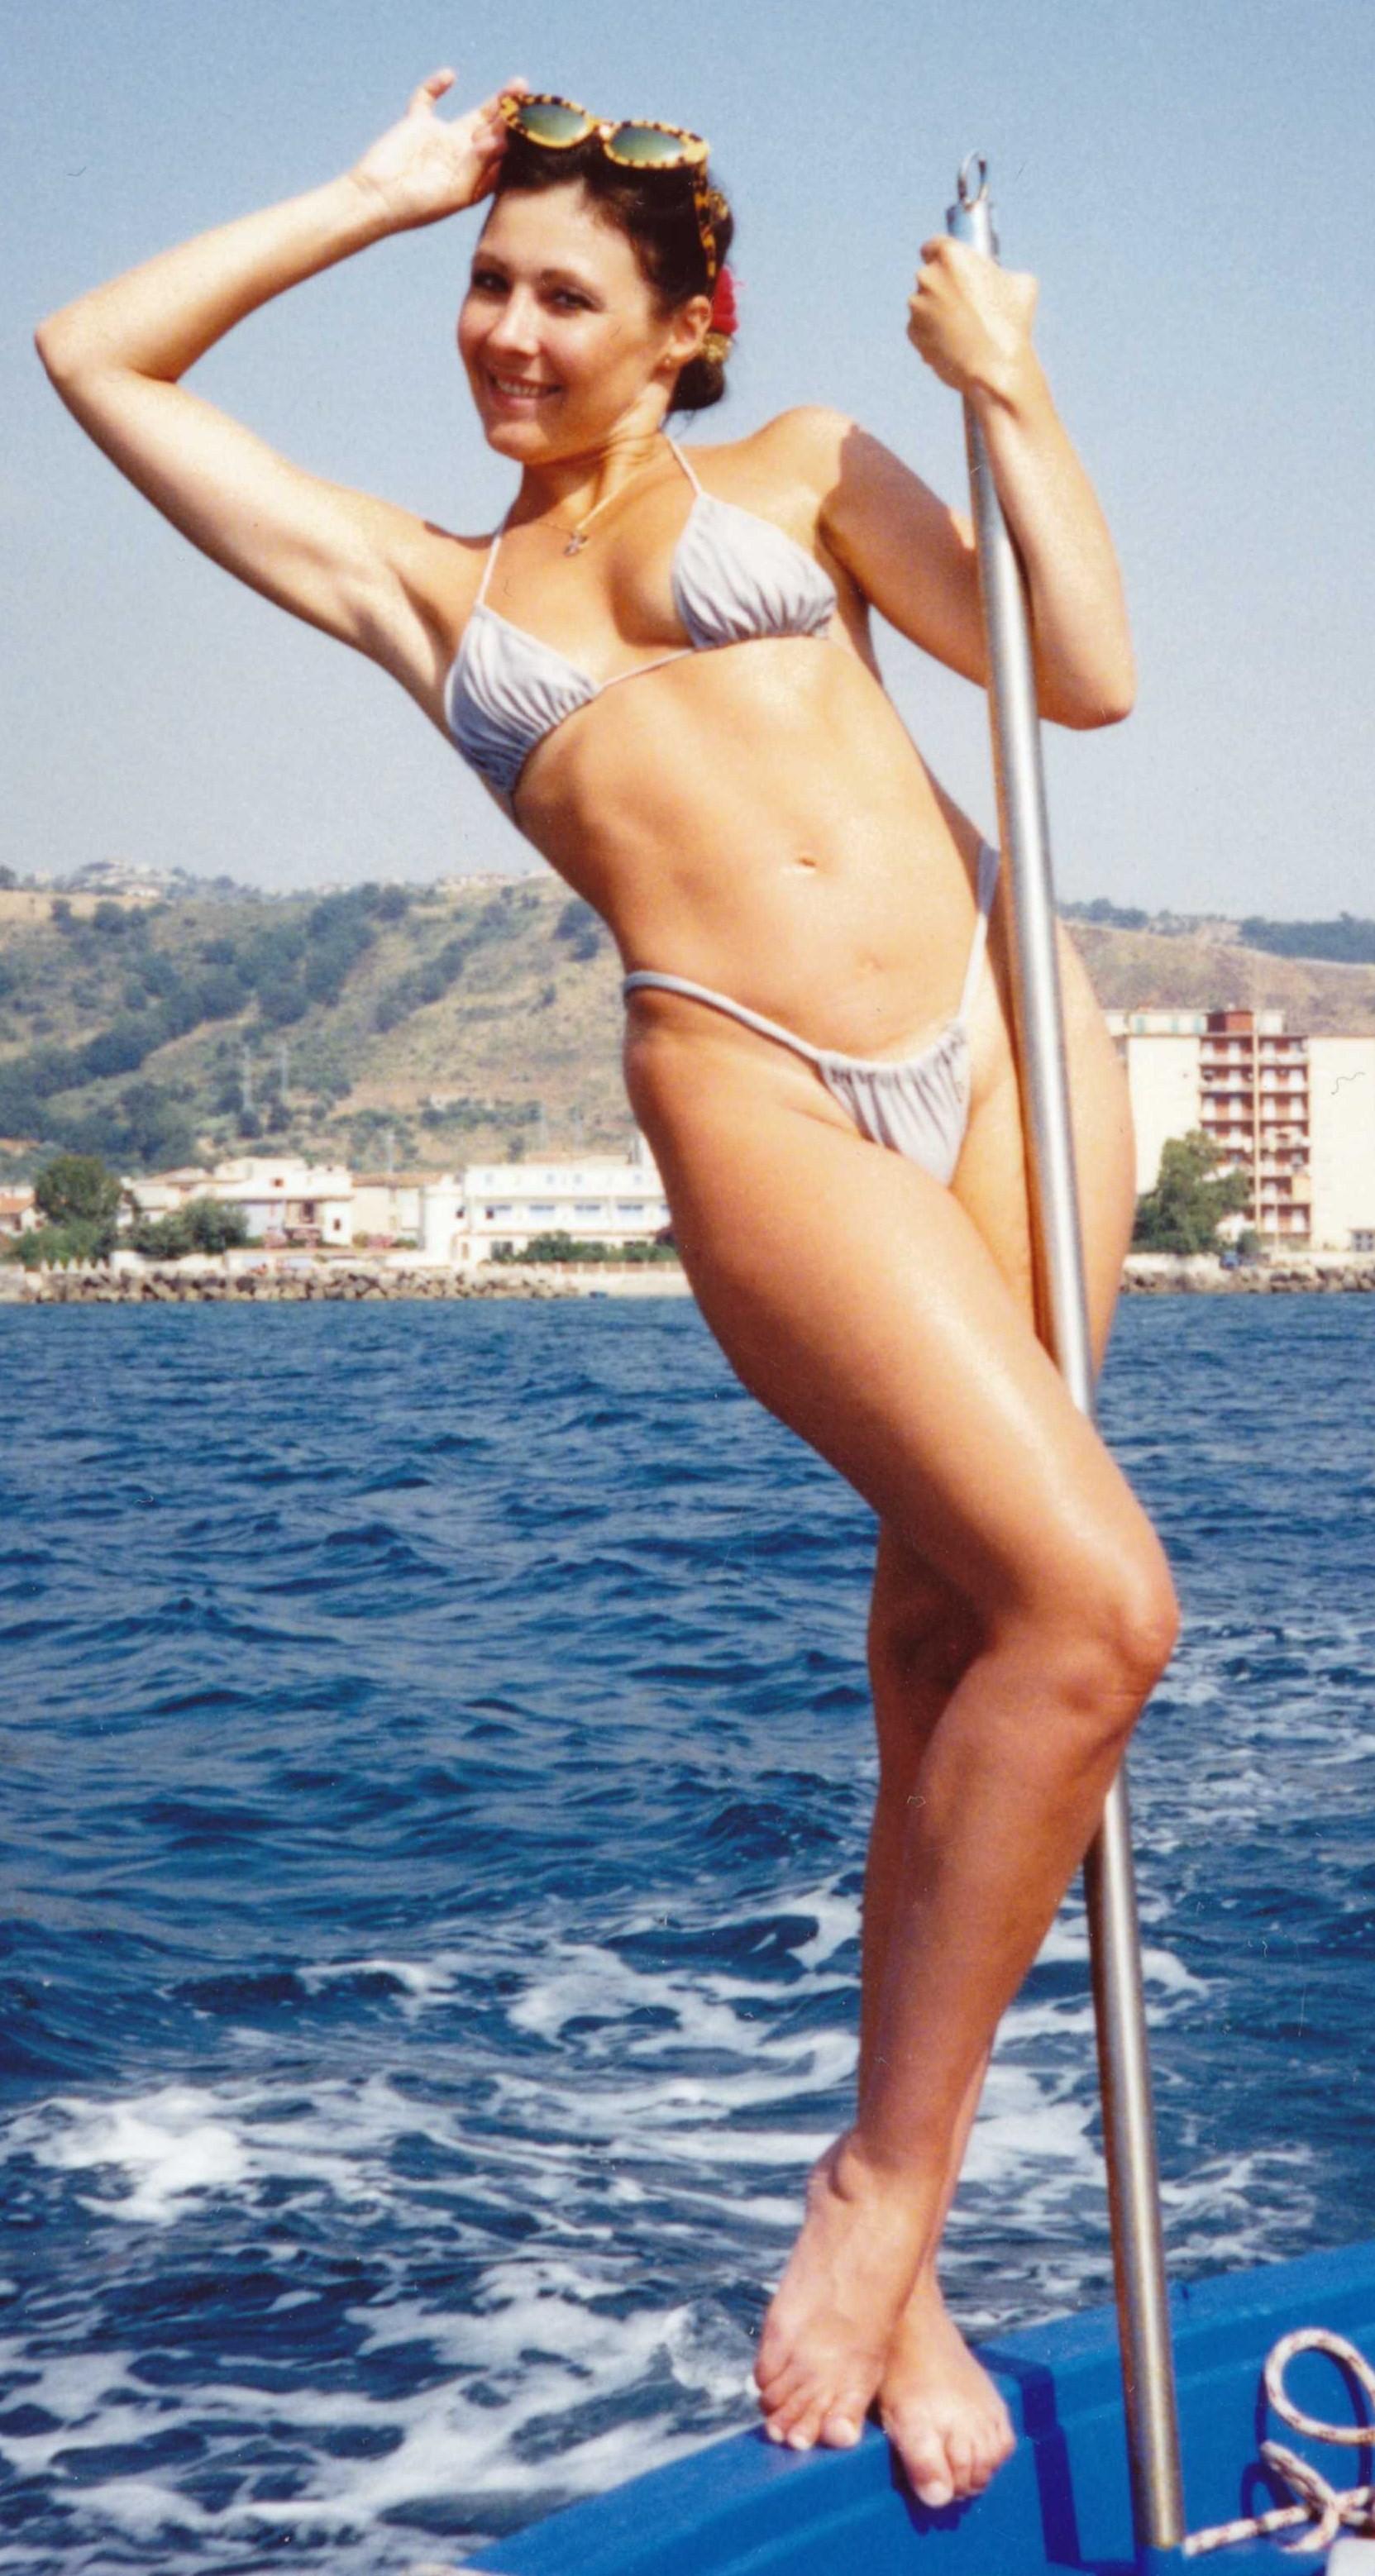 Olivia wilde nude - 2 part 4